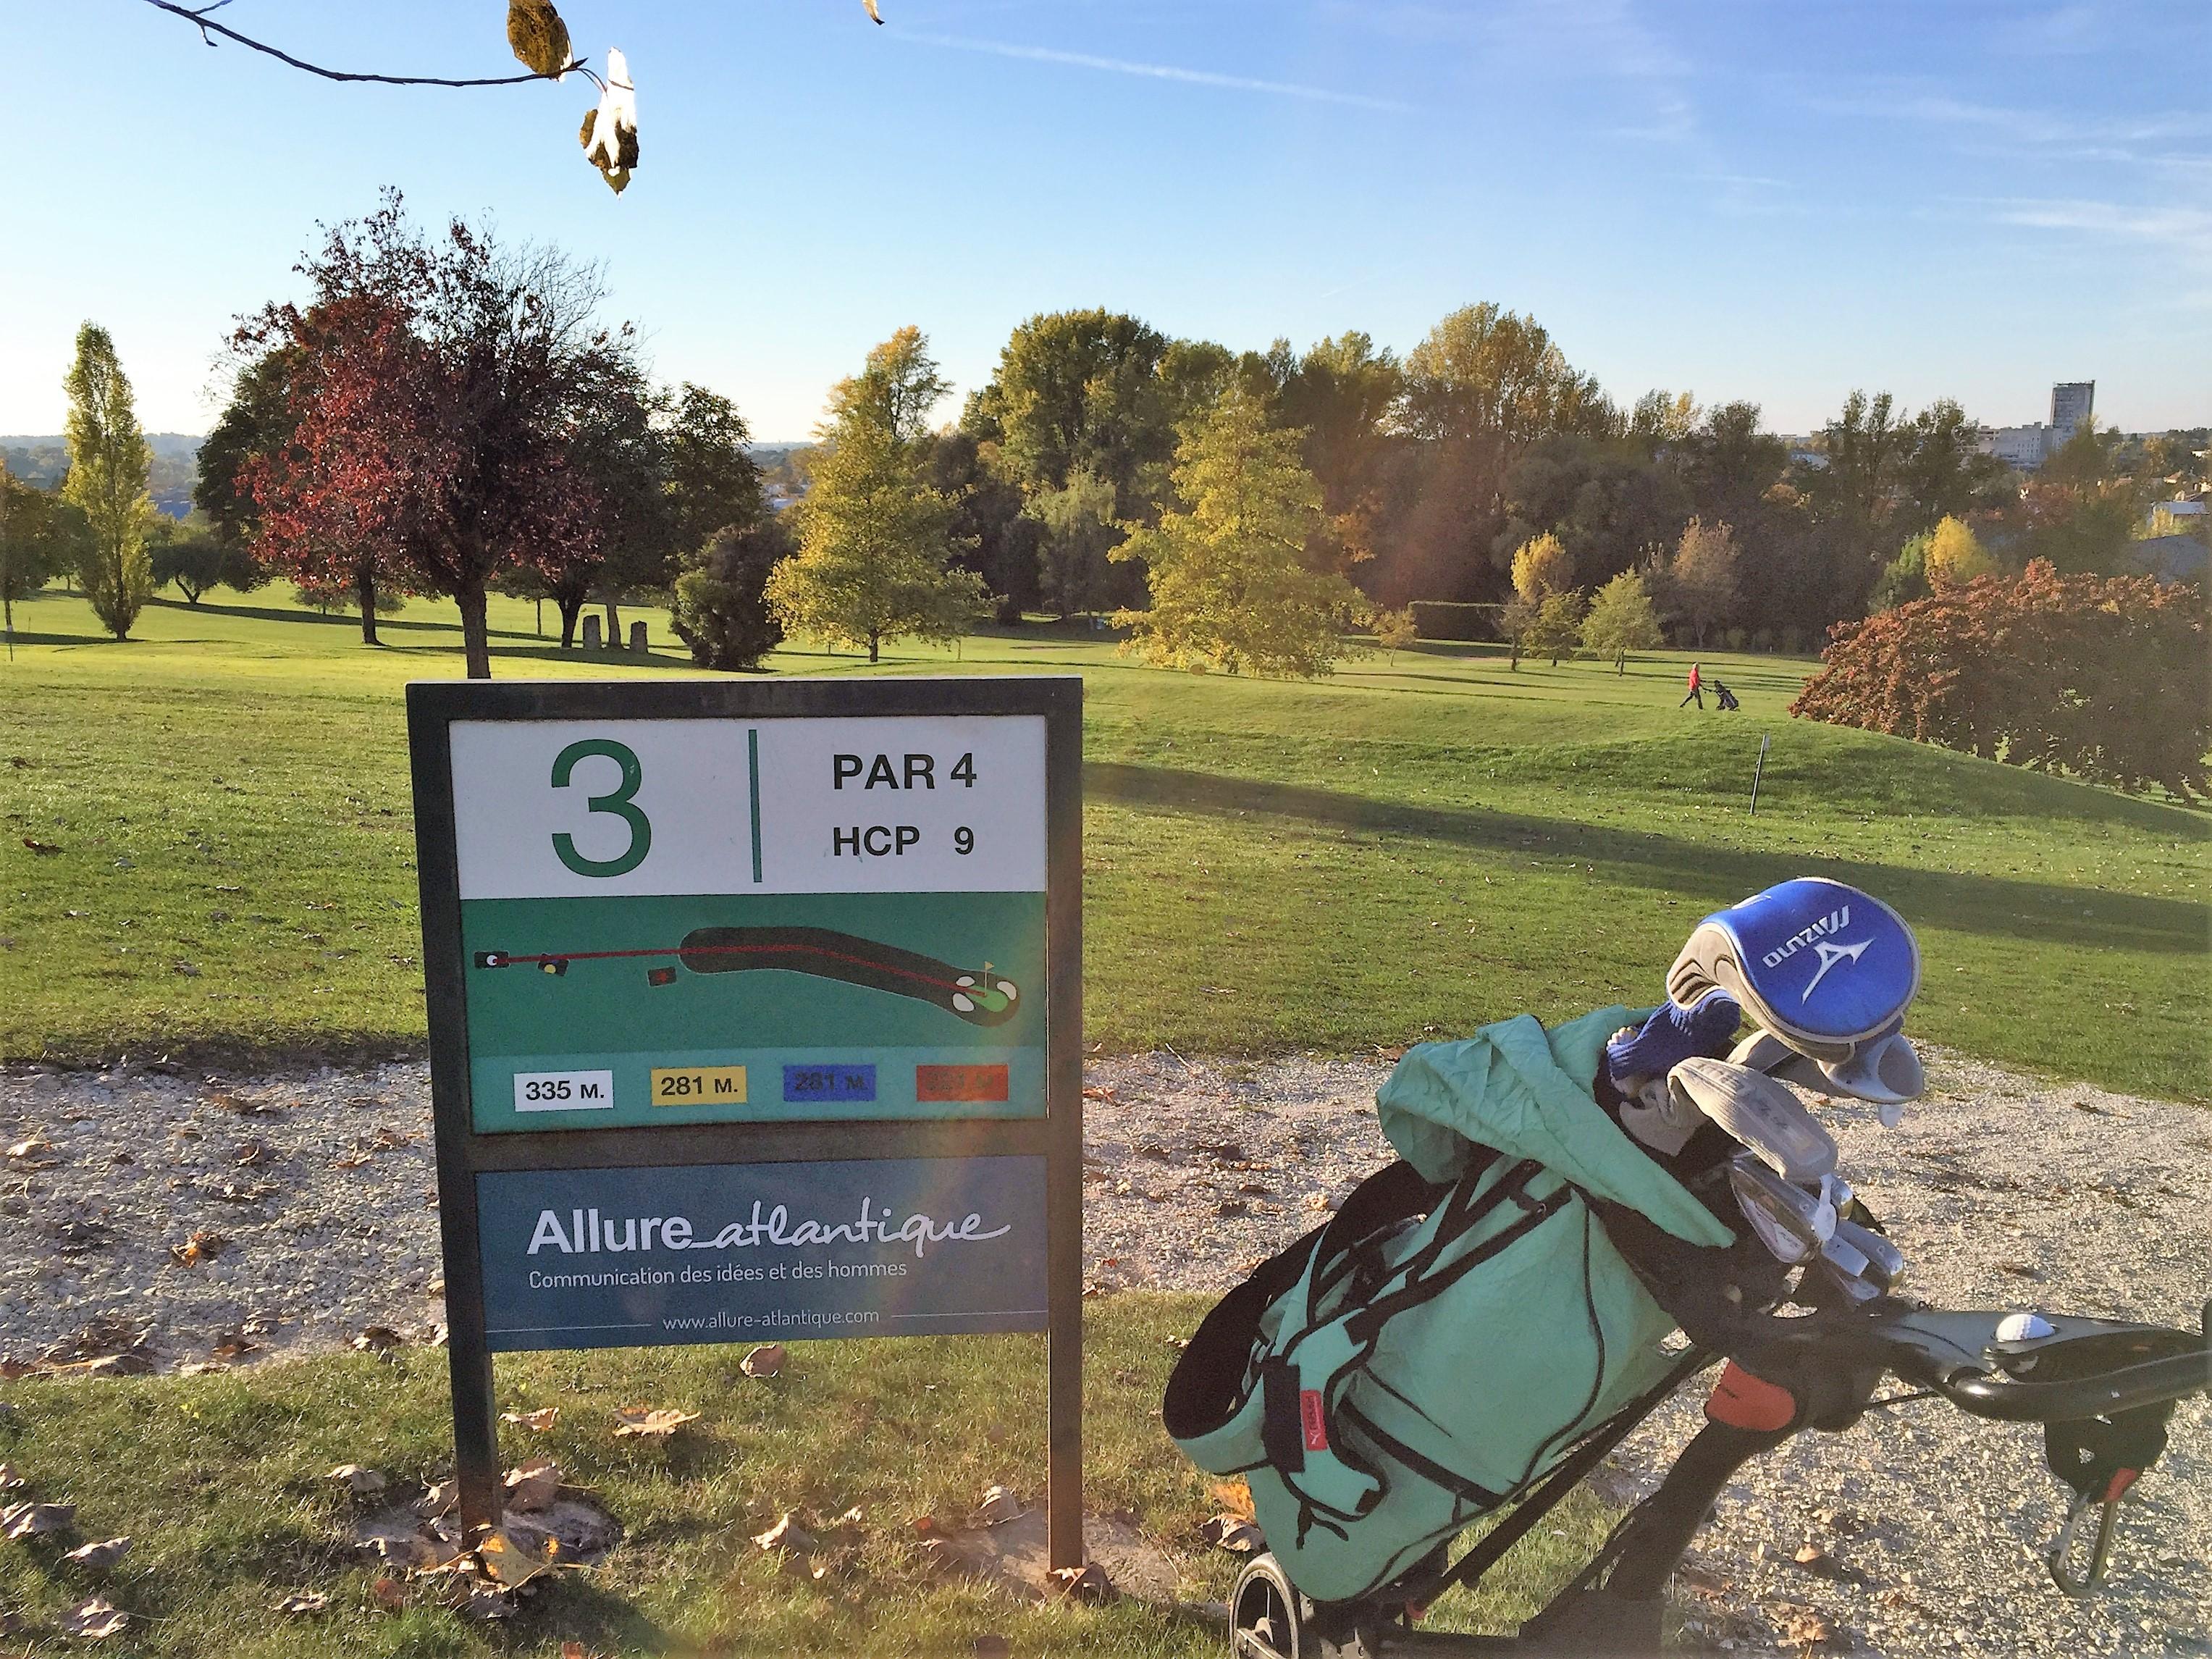 livingincognac 2016 golf de l'hirondelle Allure Atlantique